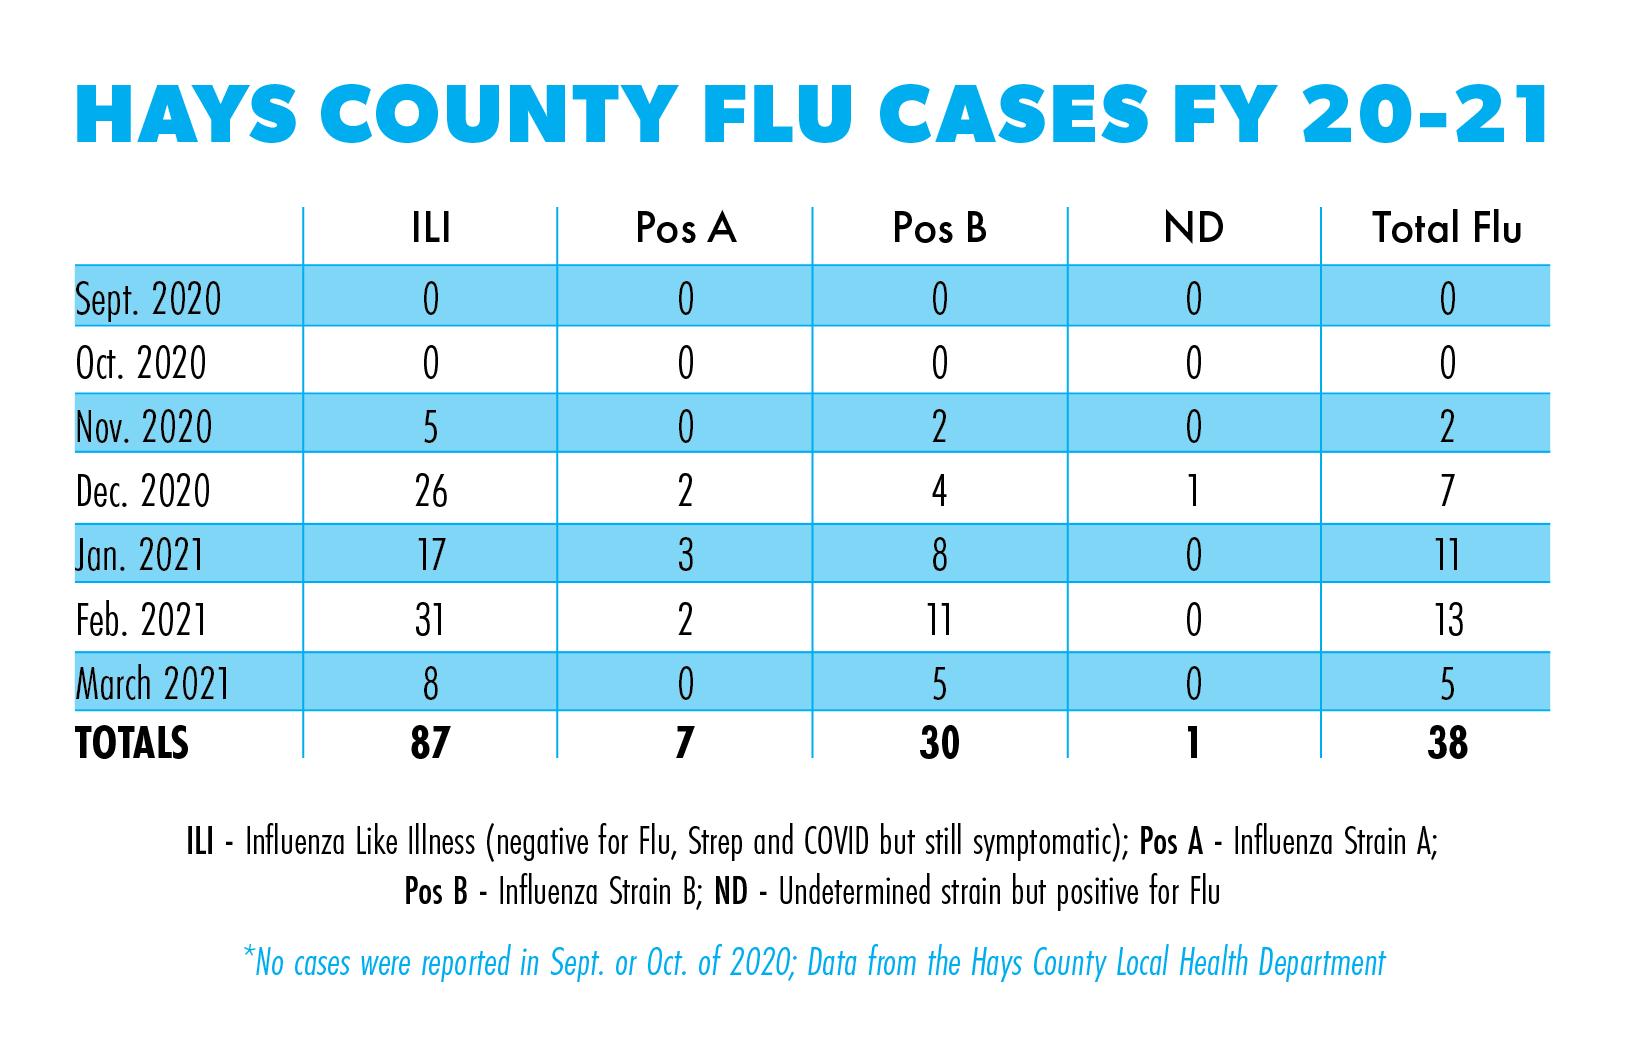 Flu testing minimal but COVID-19 precautions help prevent viral spread